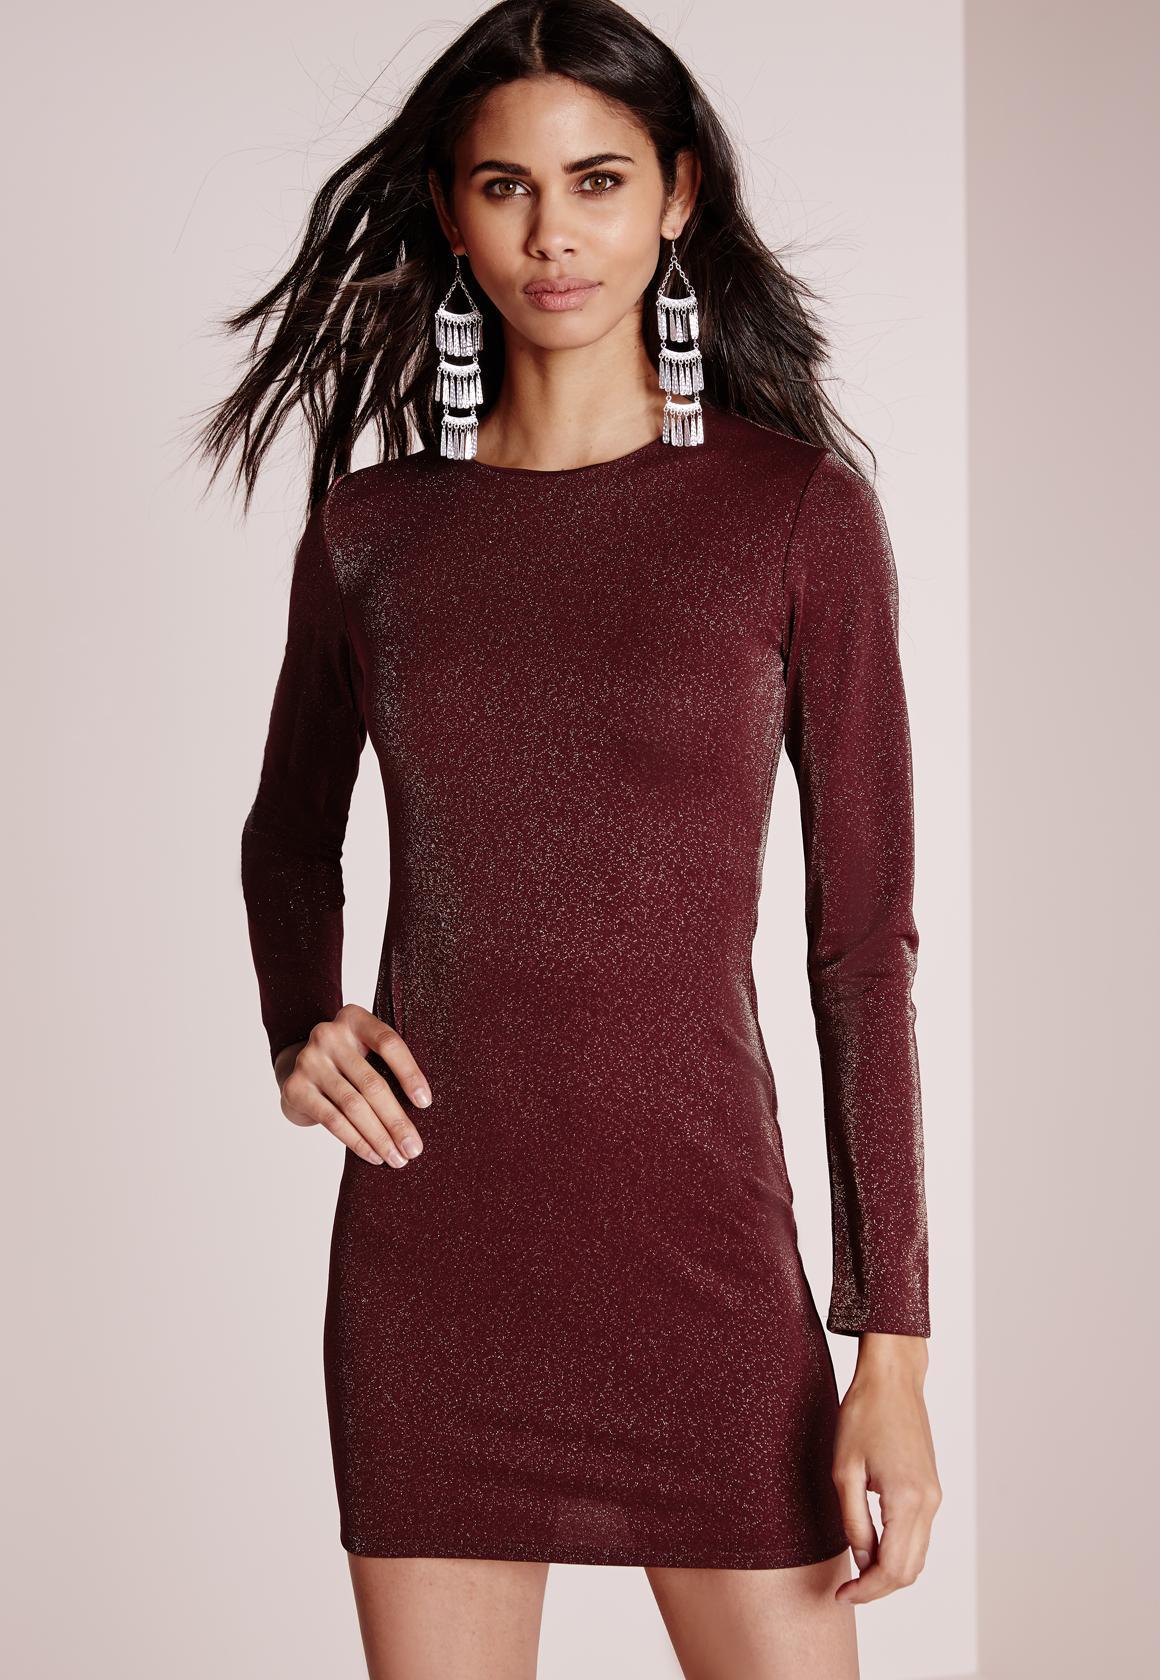 Burgundy dress long